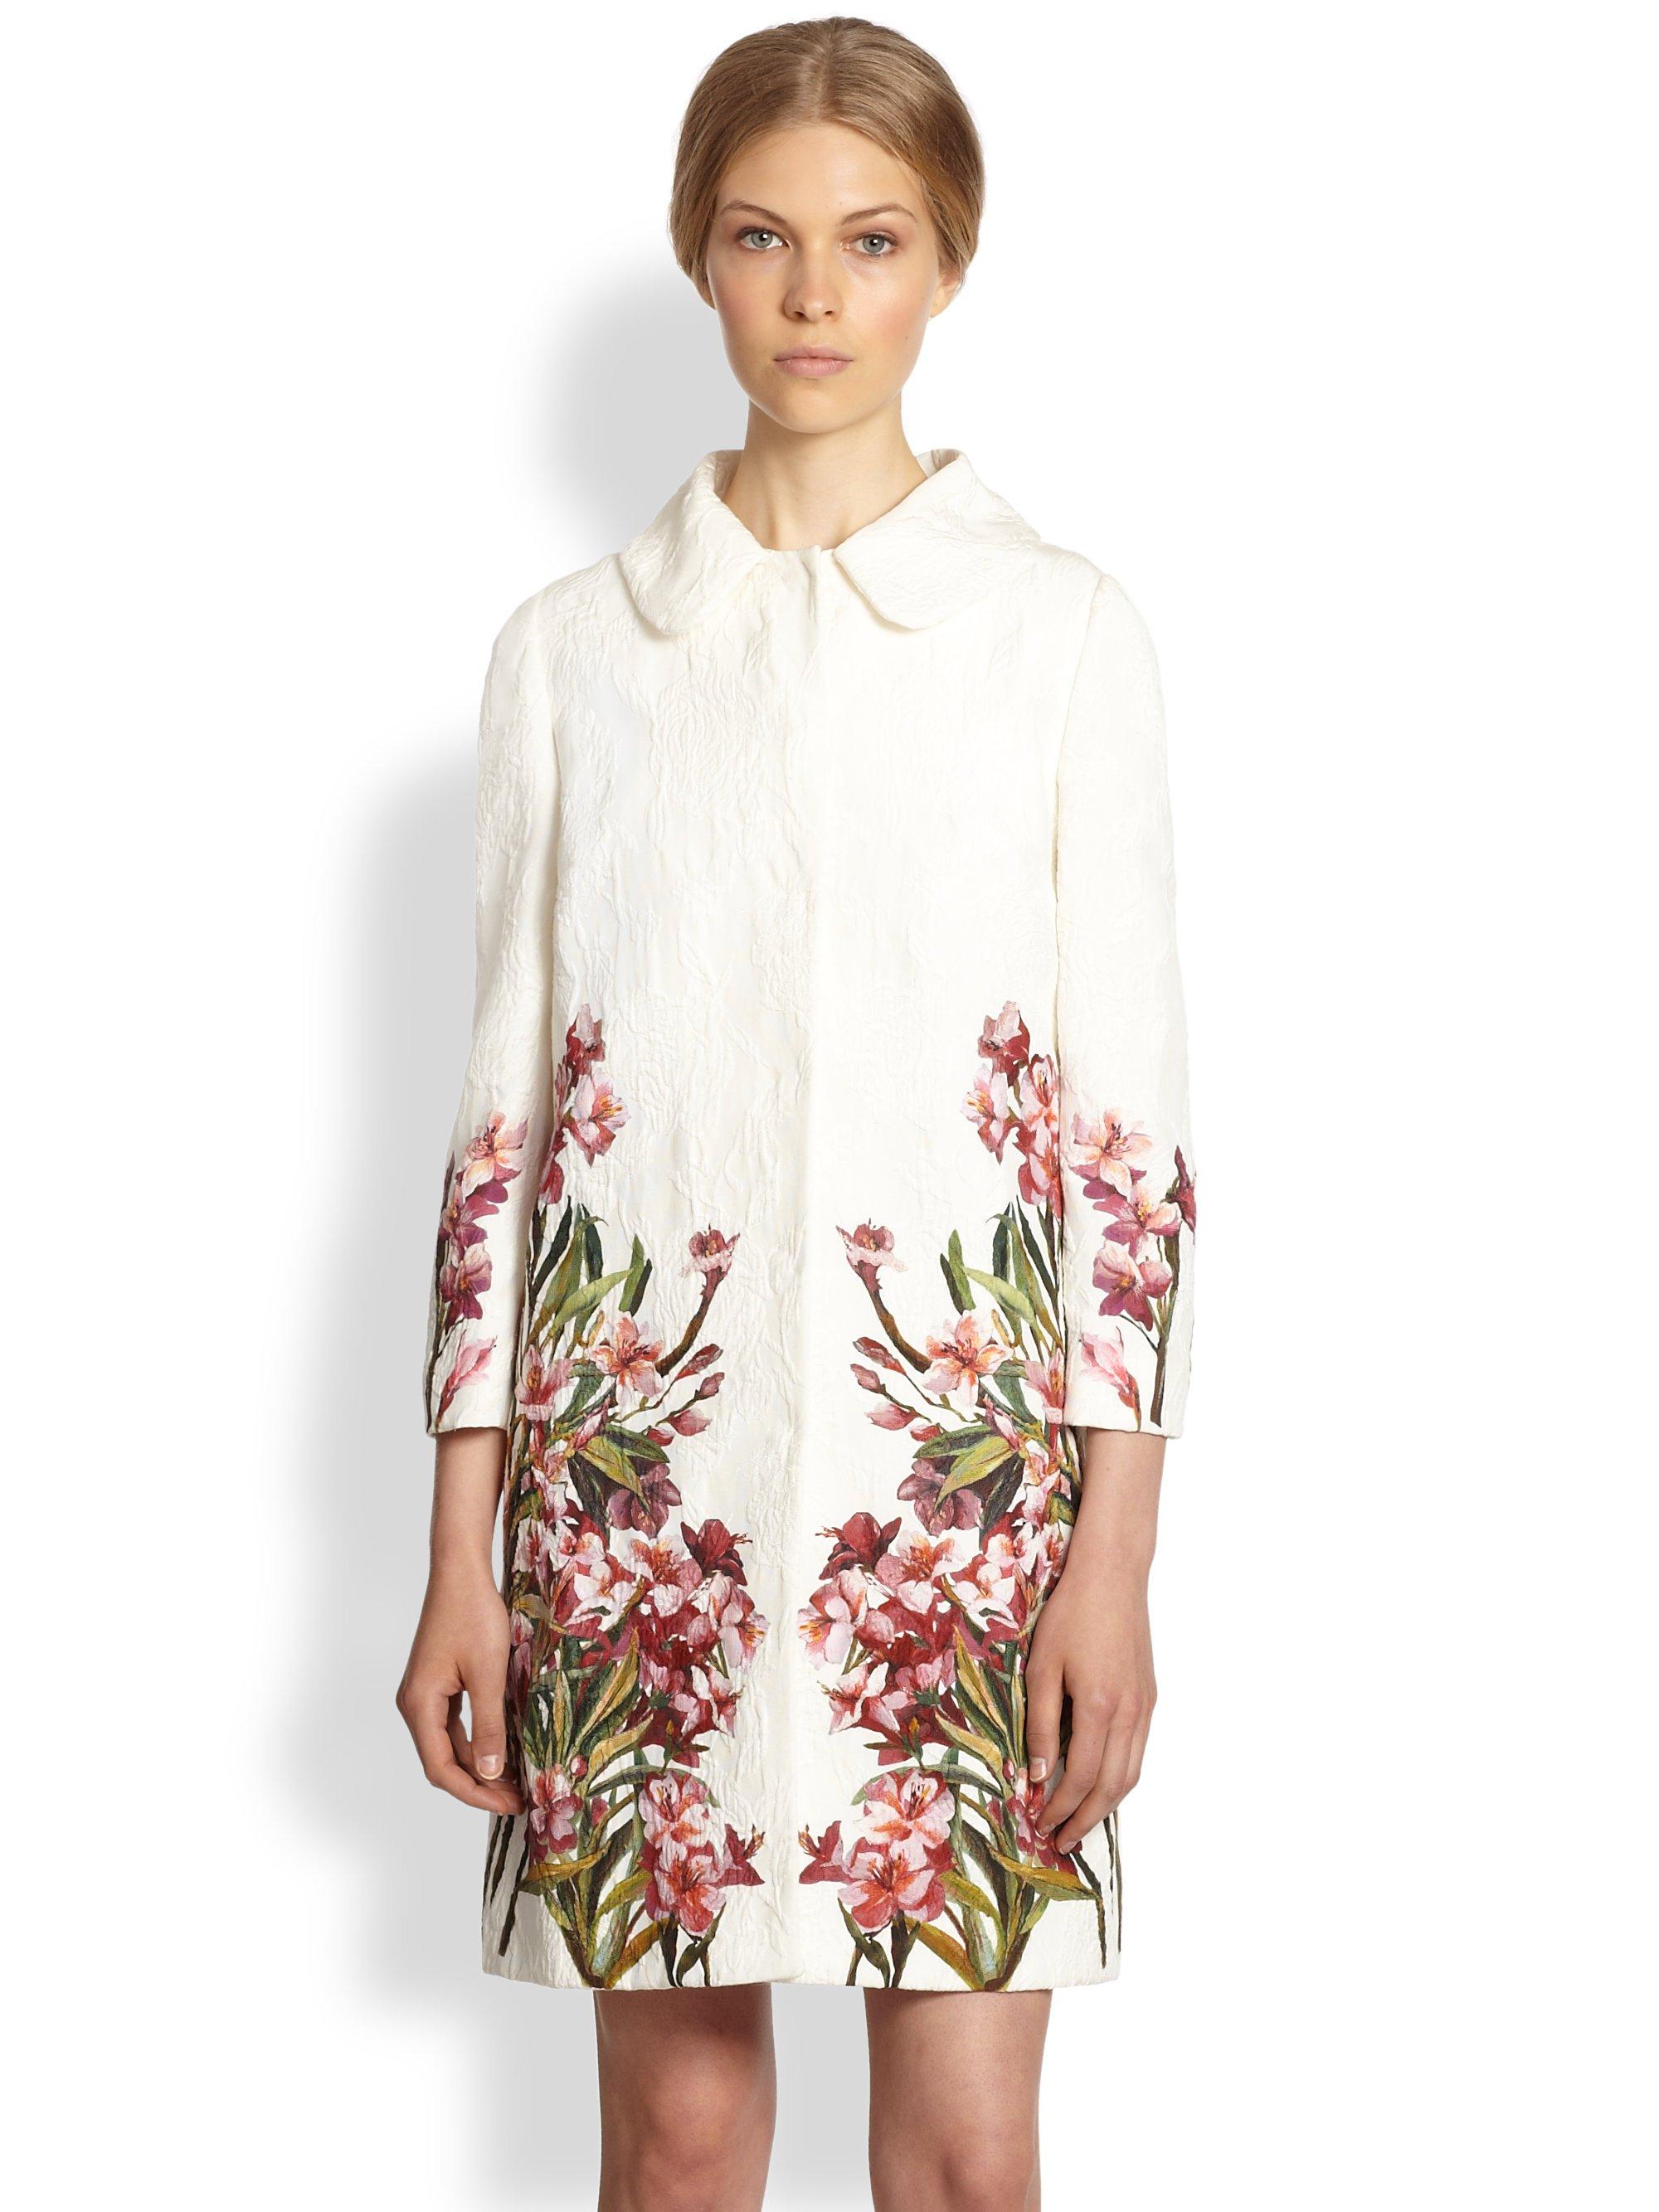 e98039b6537ea Lyst - Dolce   Gabbana Floral Print Jacquard Top Coat in Natural